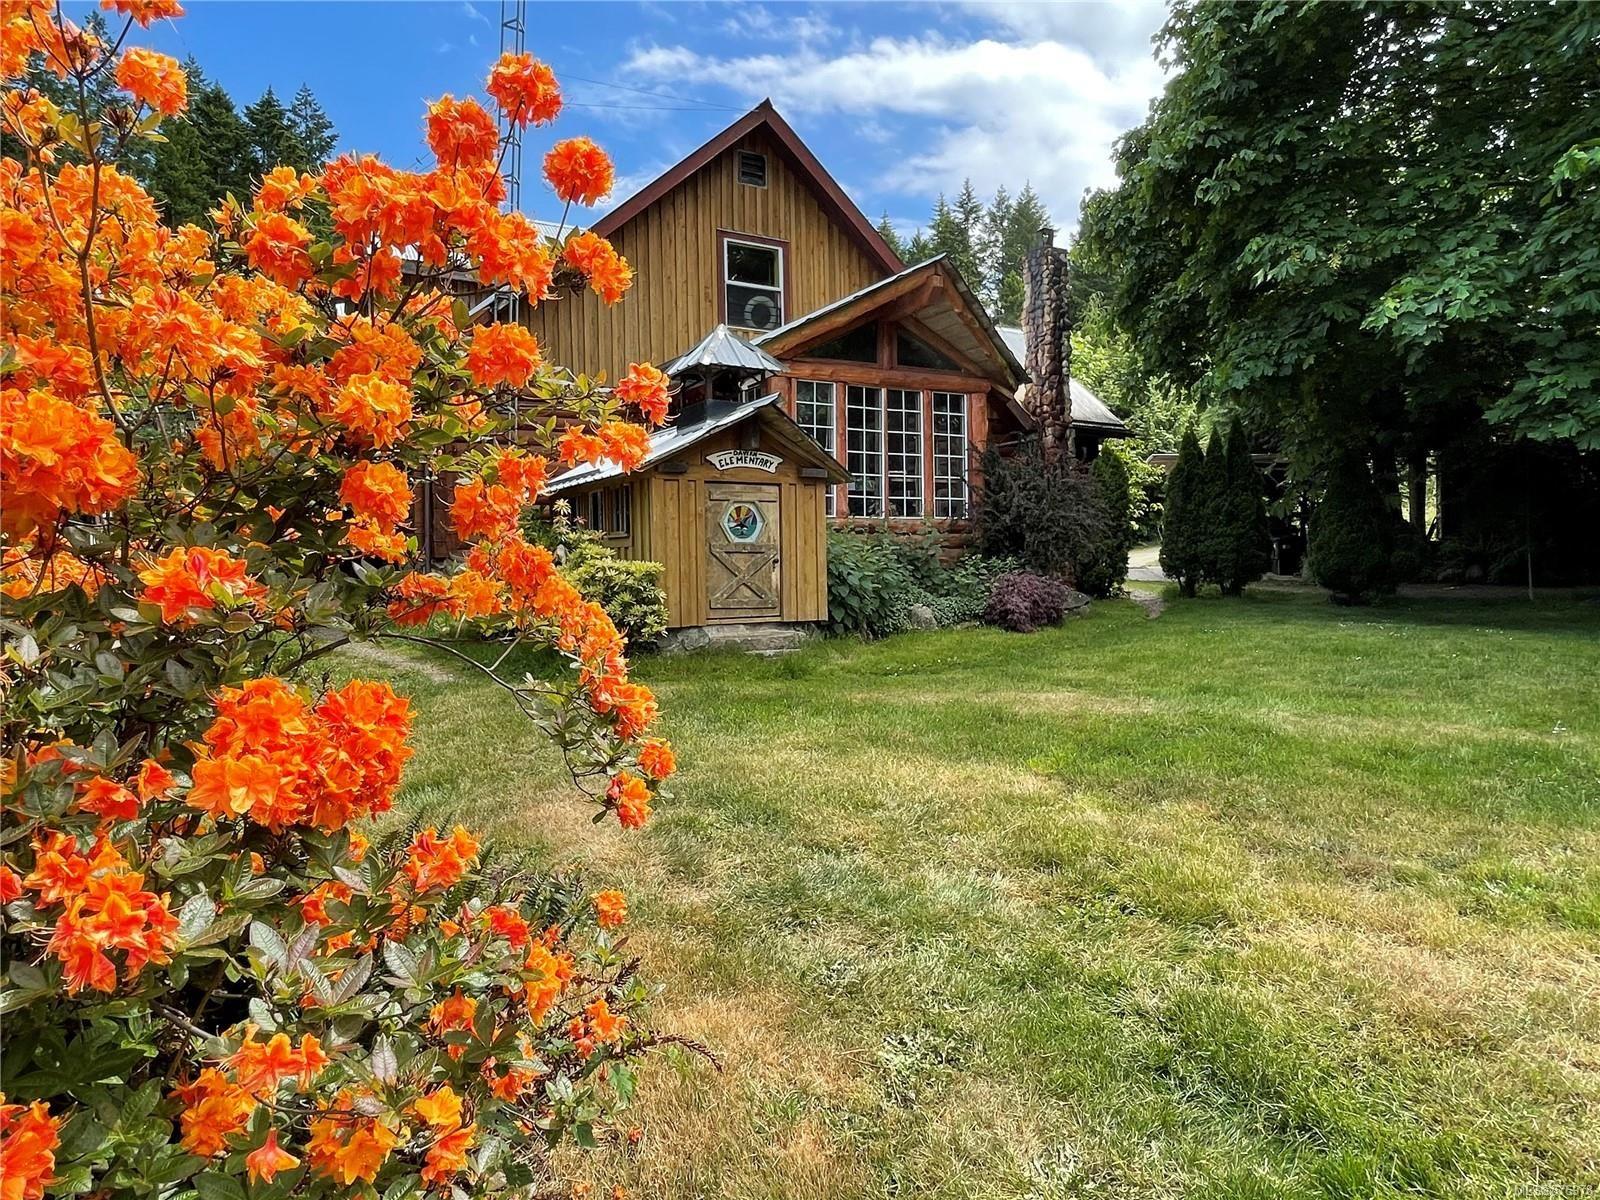 Main Photo: 1760 Seymour Rd in : Isl Gabriola Island House for sale (Islands)  : MLS®# 876978